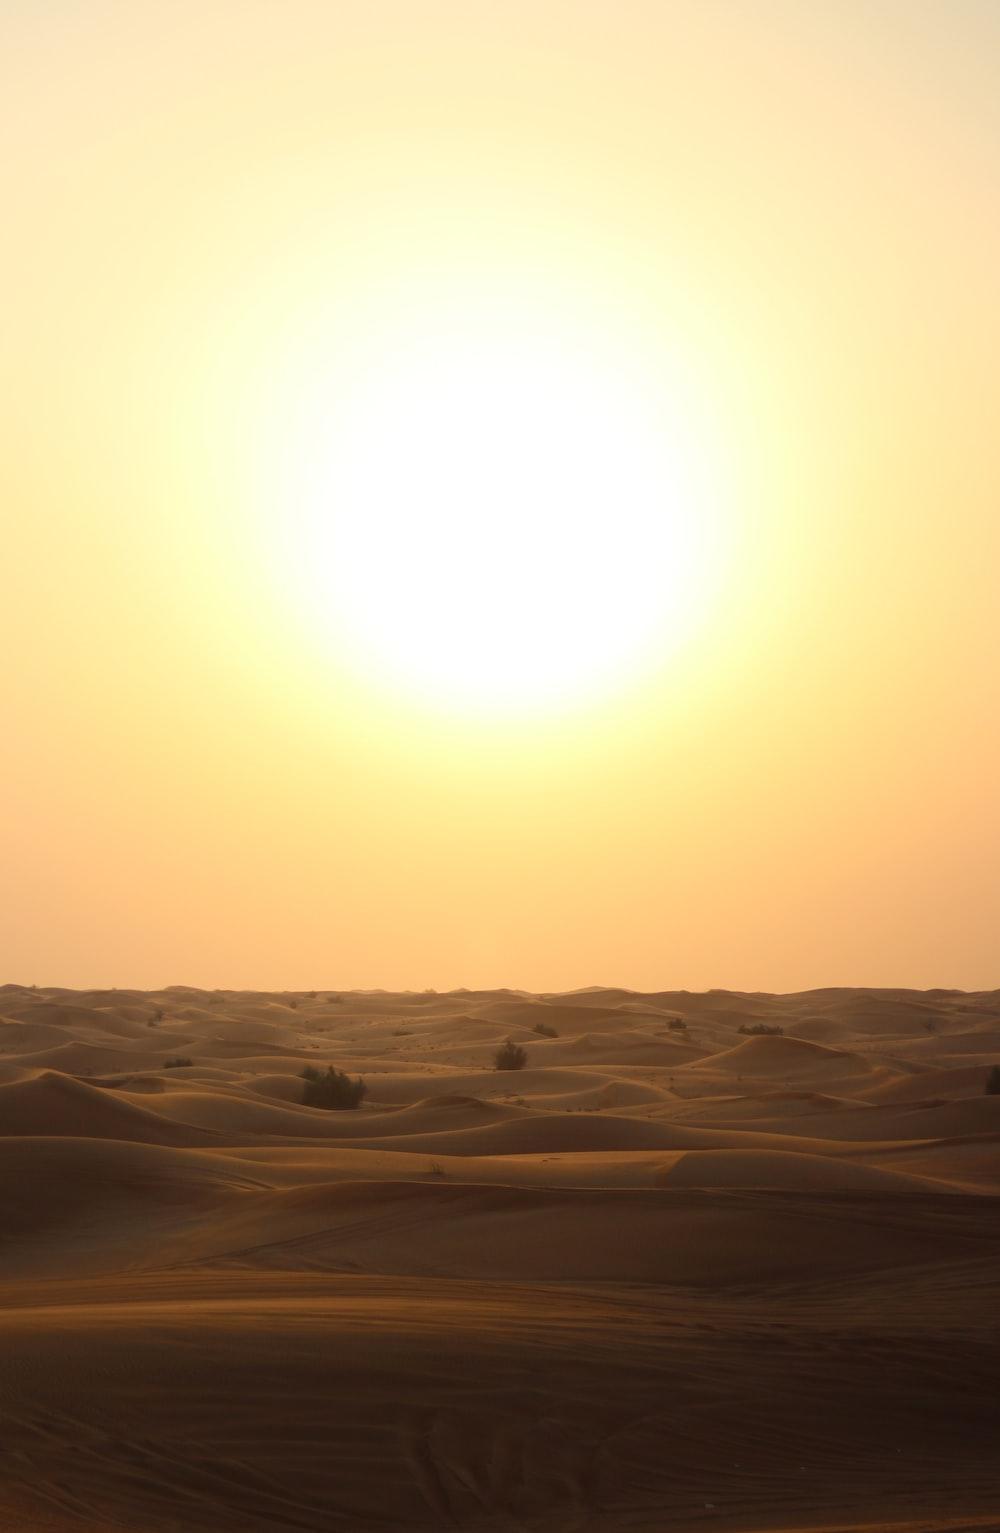 beige sand during sunset